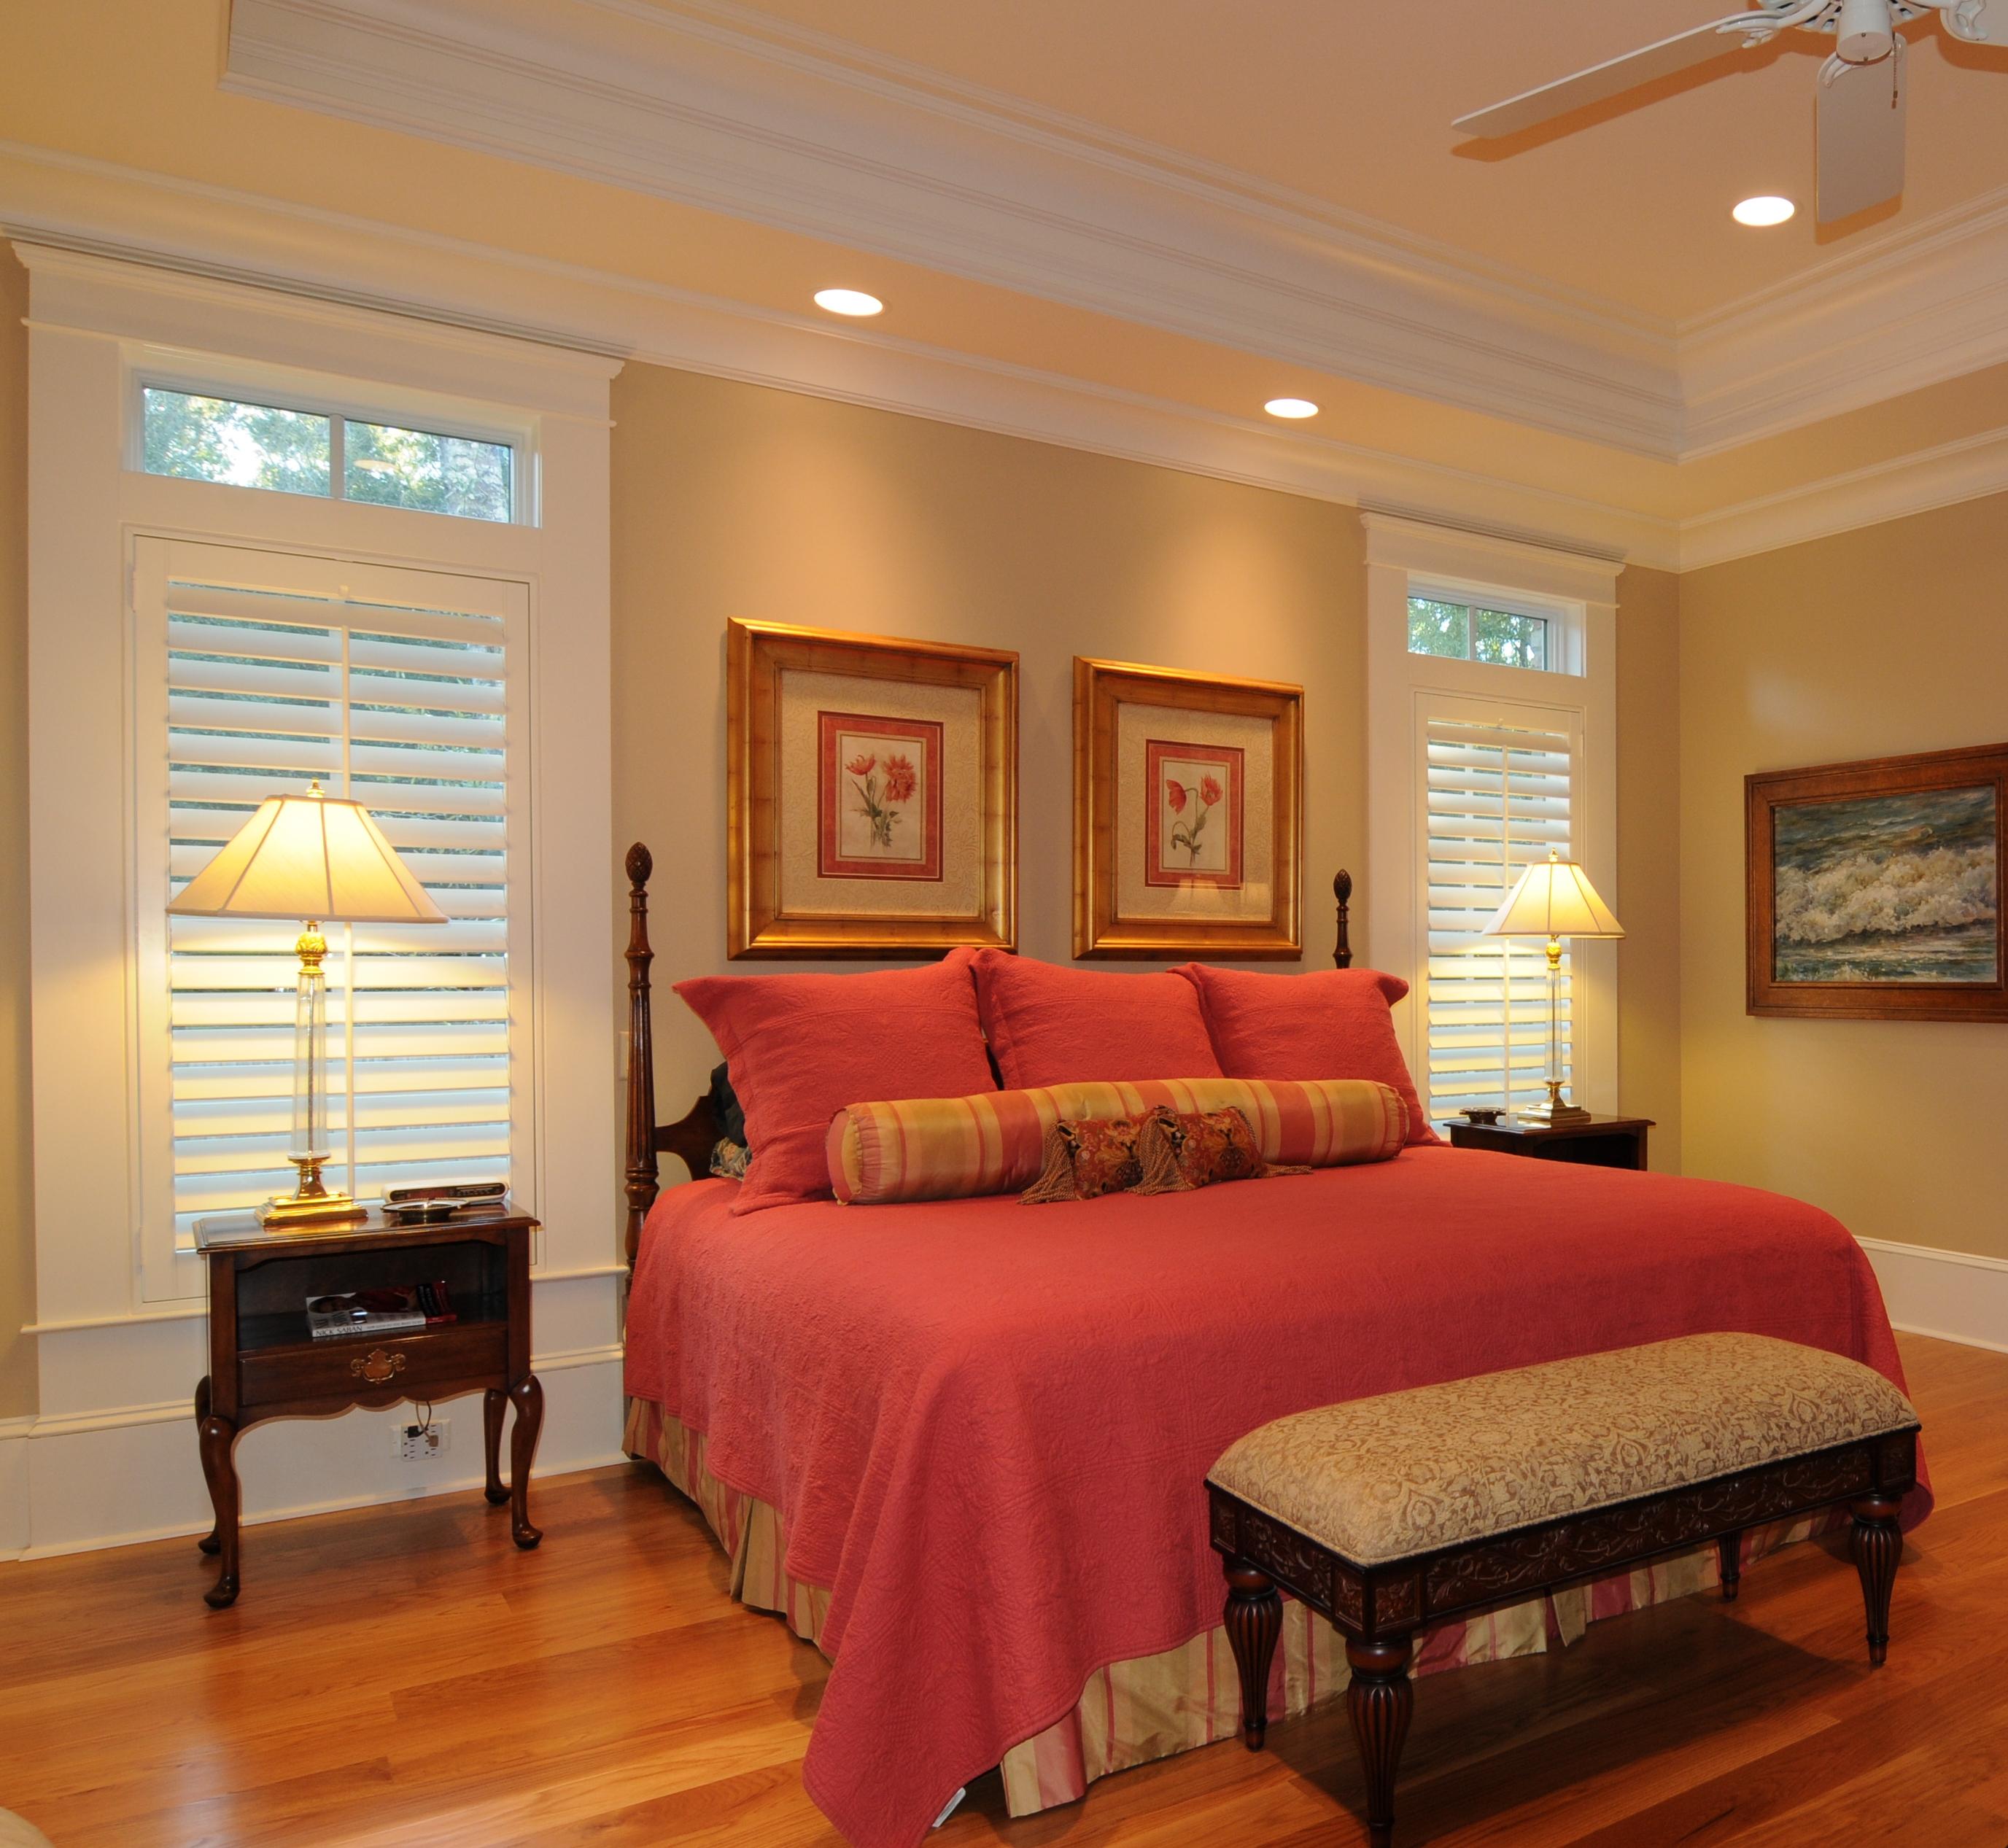 office furniture huntsville alabama trend home design homegoods 11 photos home decor 5850 university dr nw